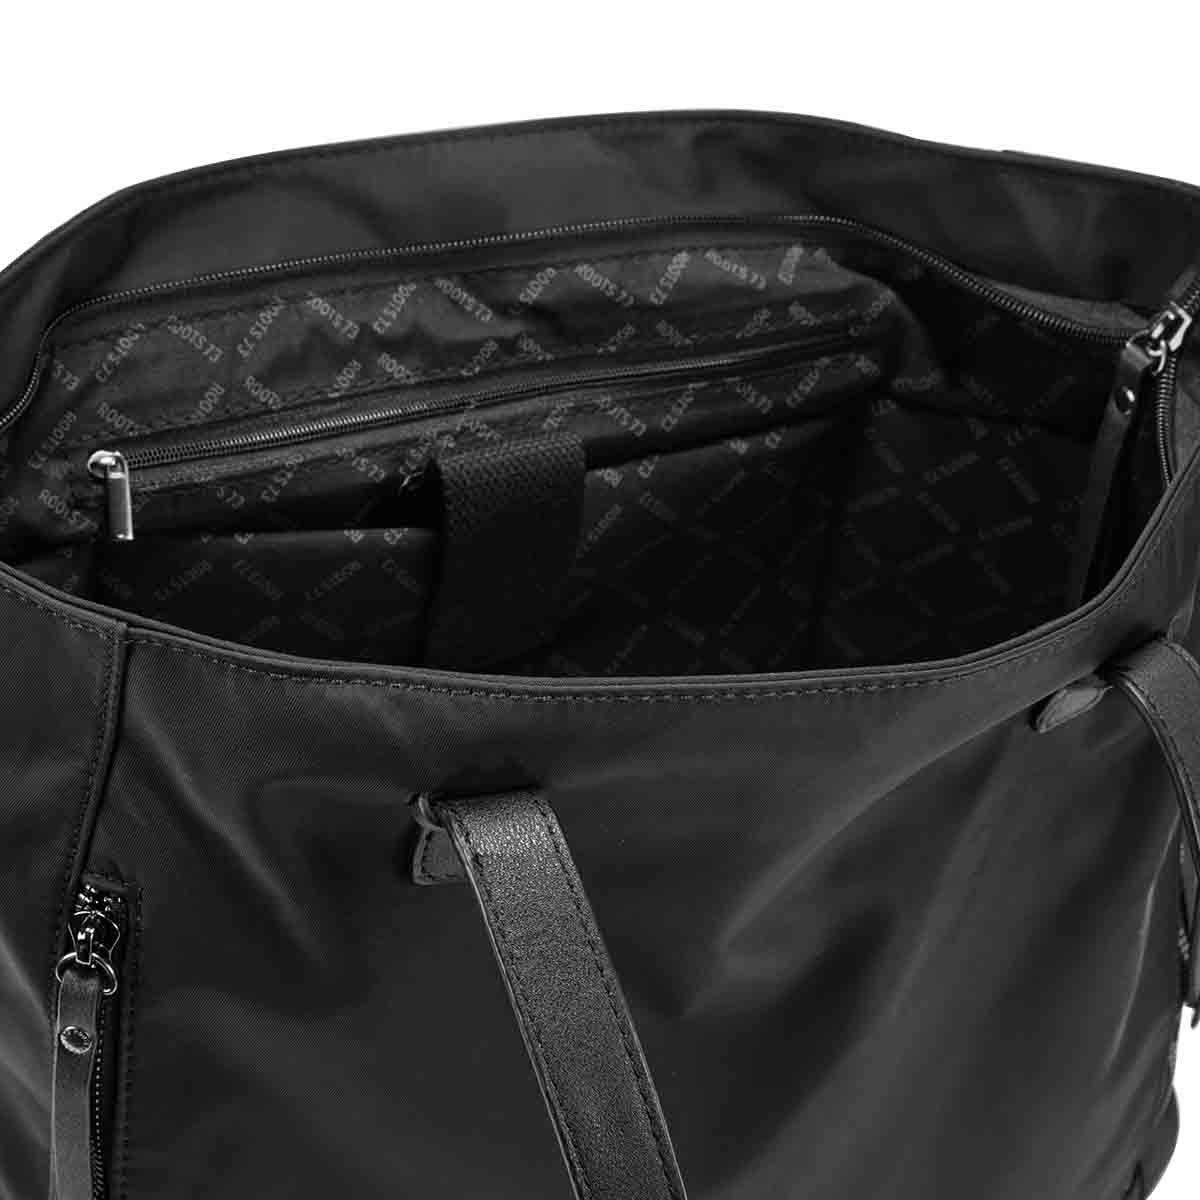 Lds Roots73 black large tote bag